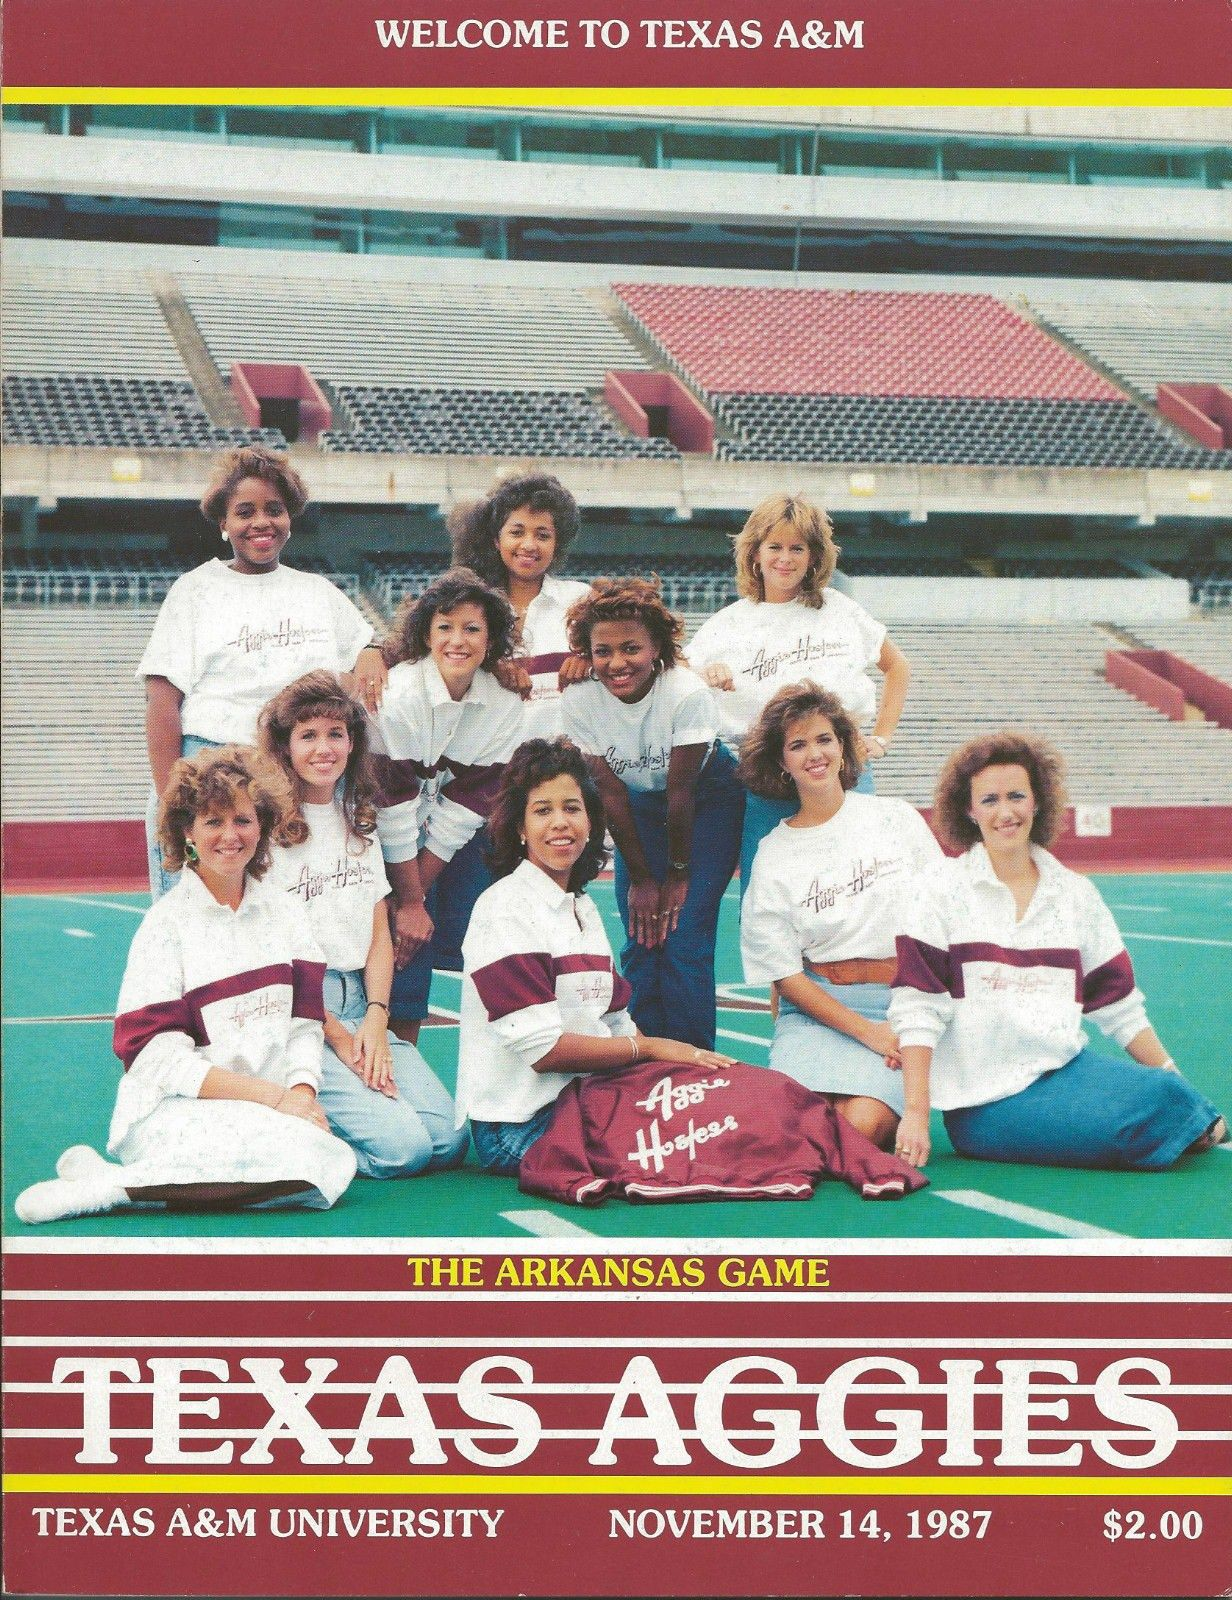 1987 Game Program between Texas A&M vs Arkansas at Kyle